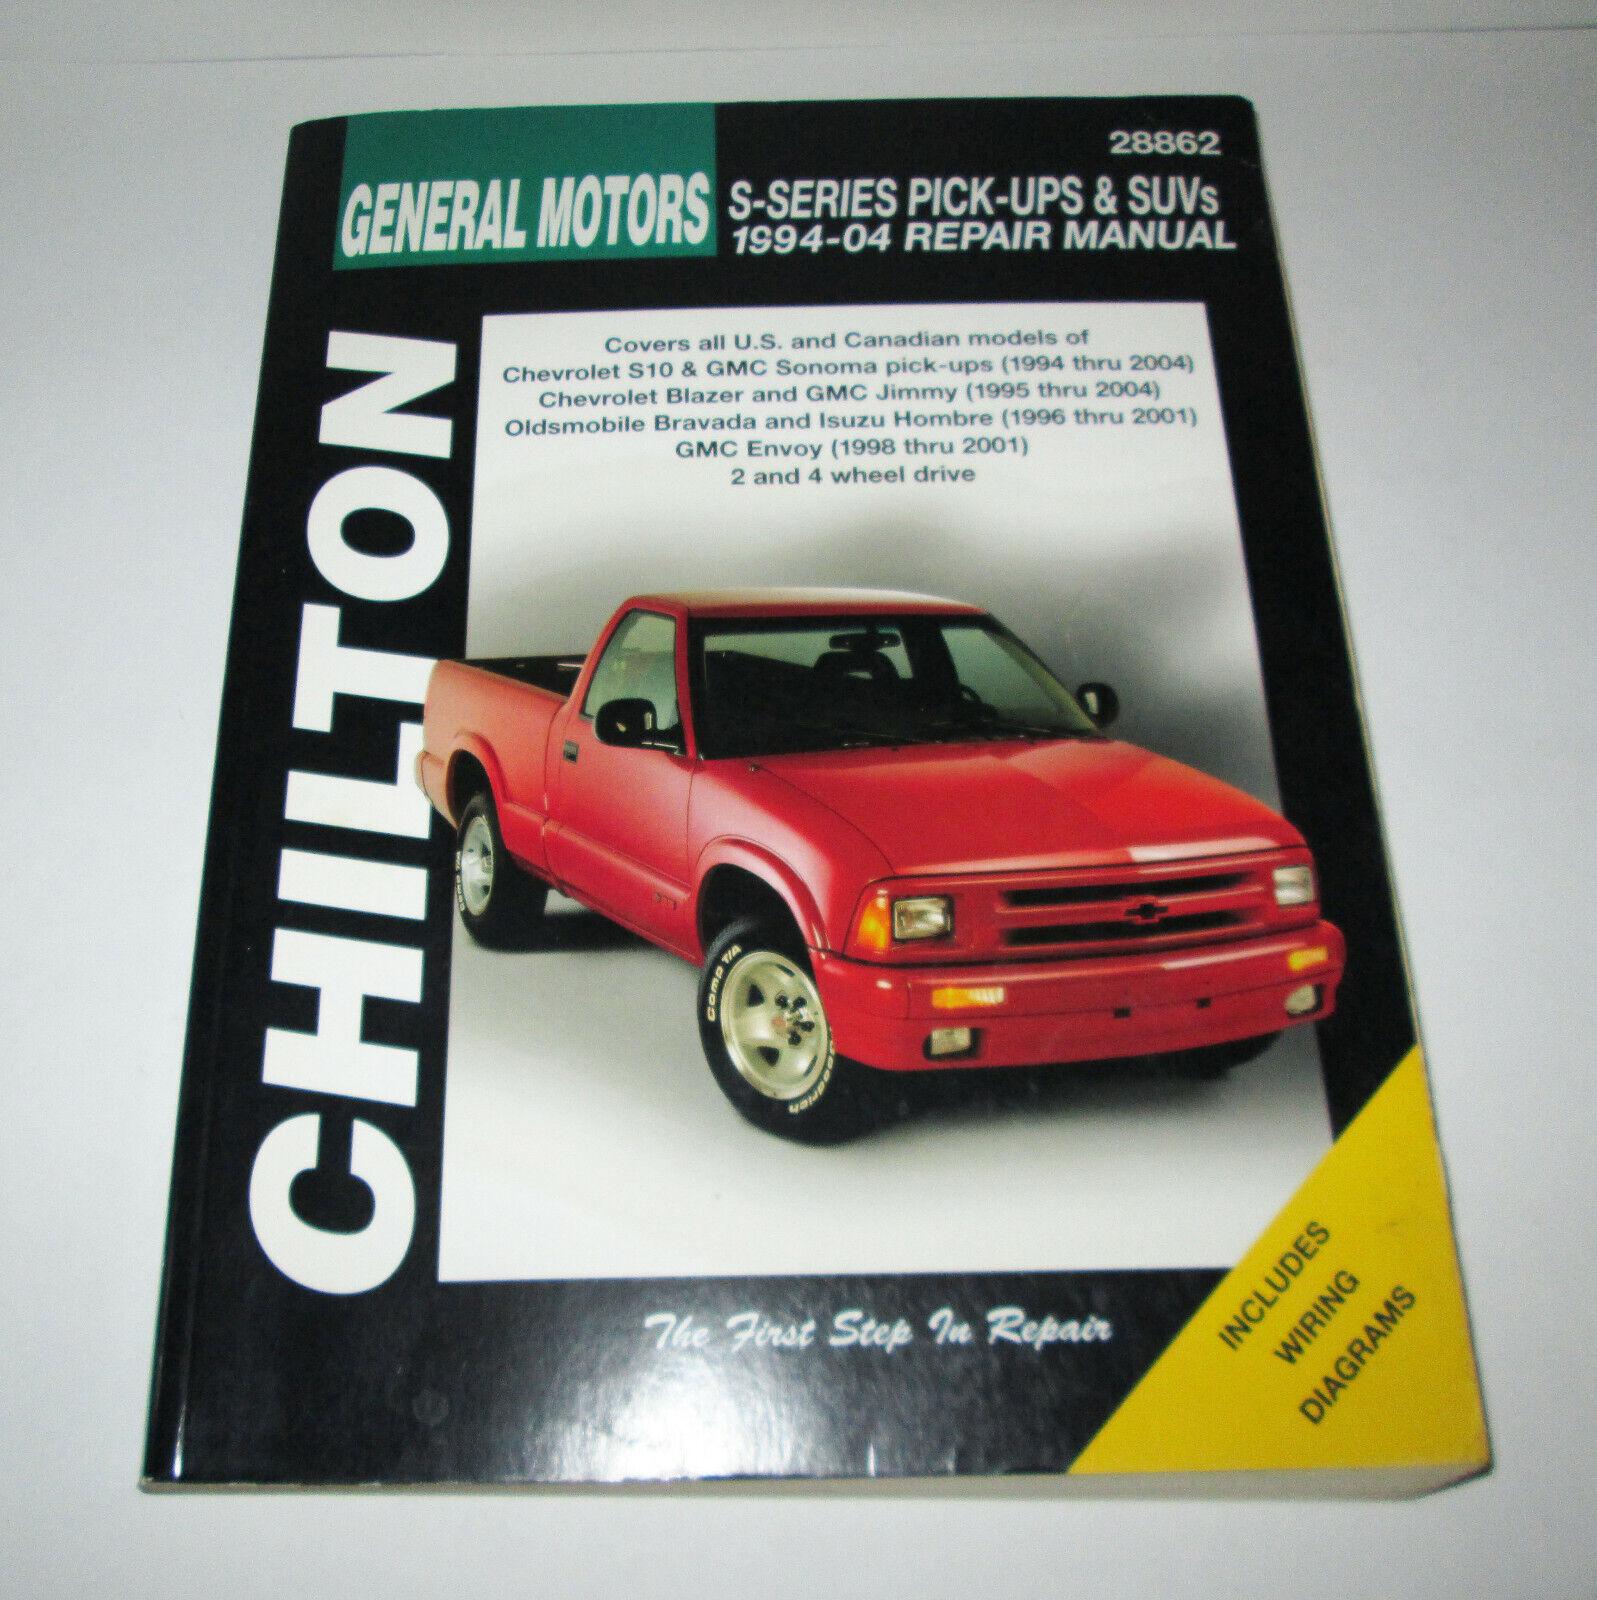 1996 isuzu hombre wiring diagram chilton workshop manual s10 sonoma blazer jimmy hombre envoy 1994  chilton workshop manual s10 sonoma